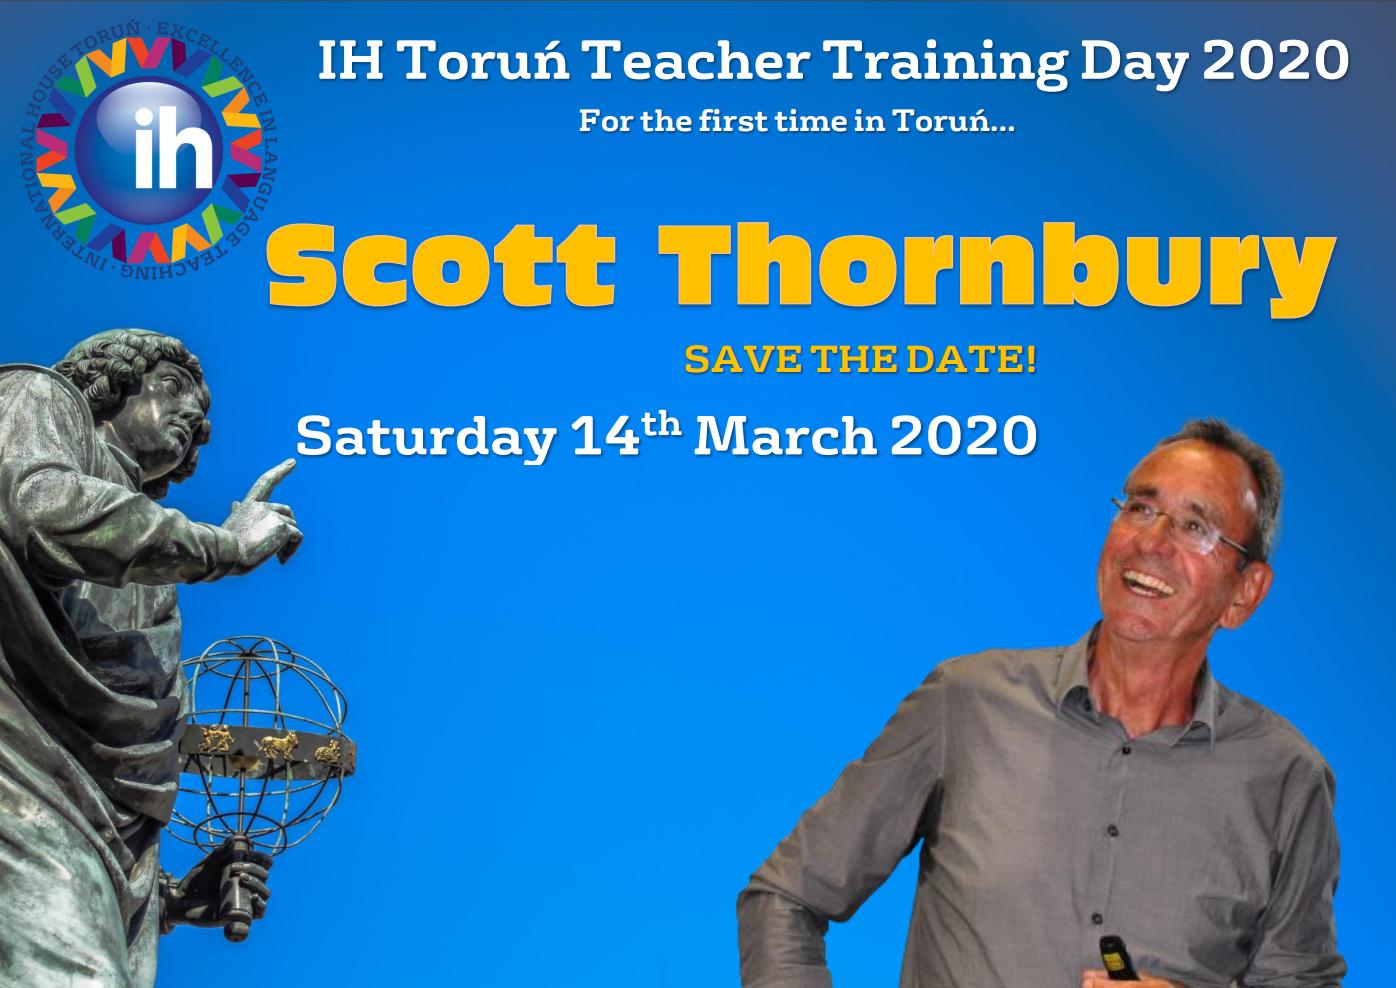 IH Torun TTD 2020 poster